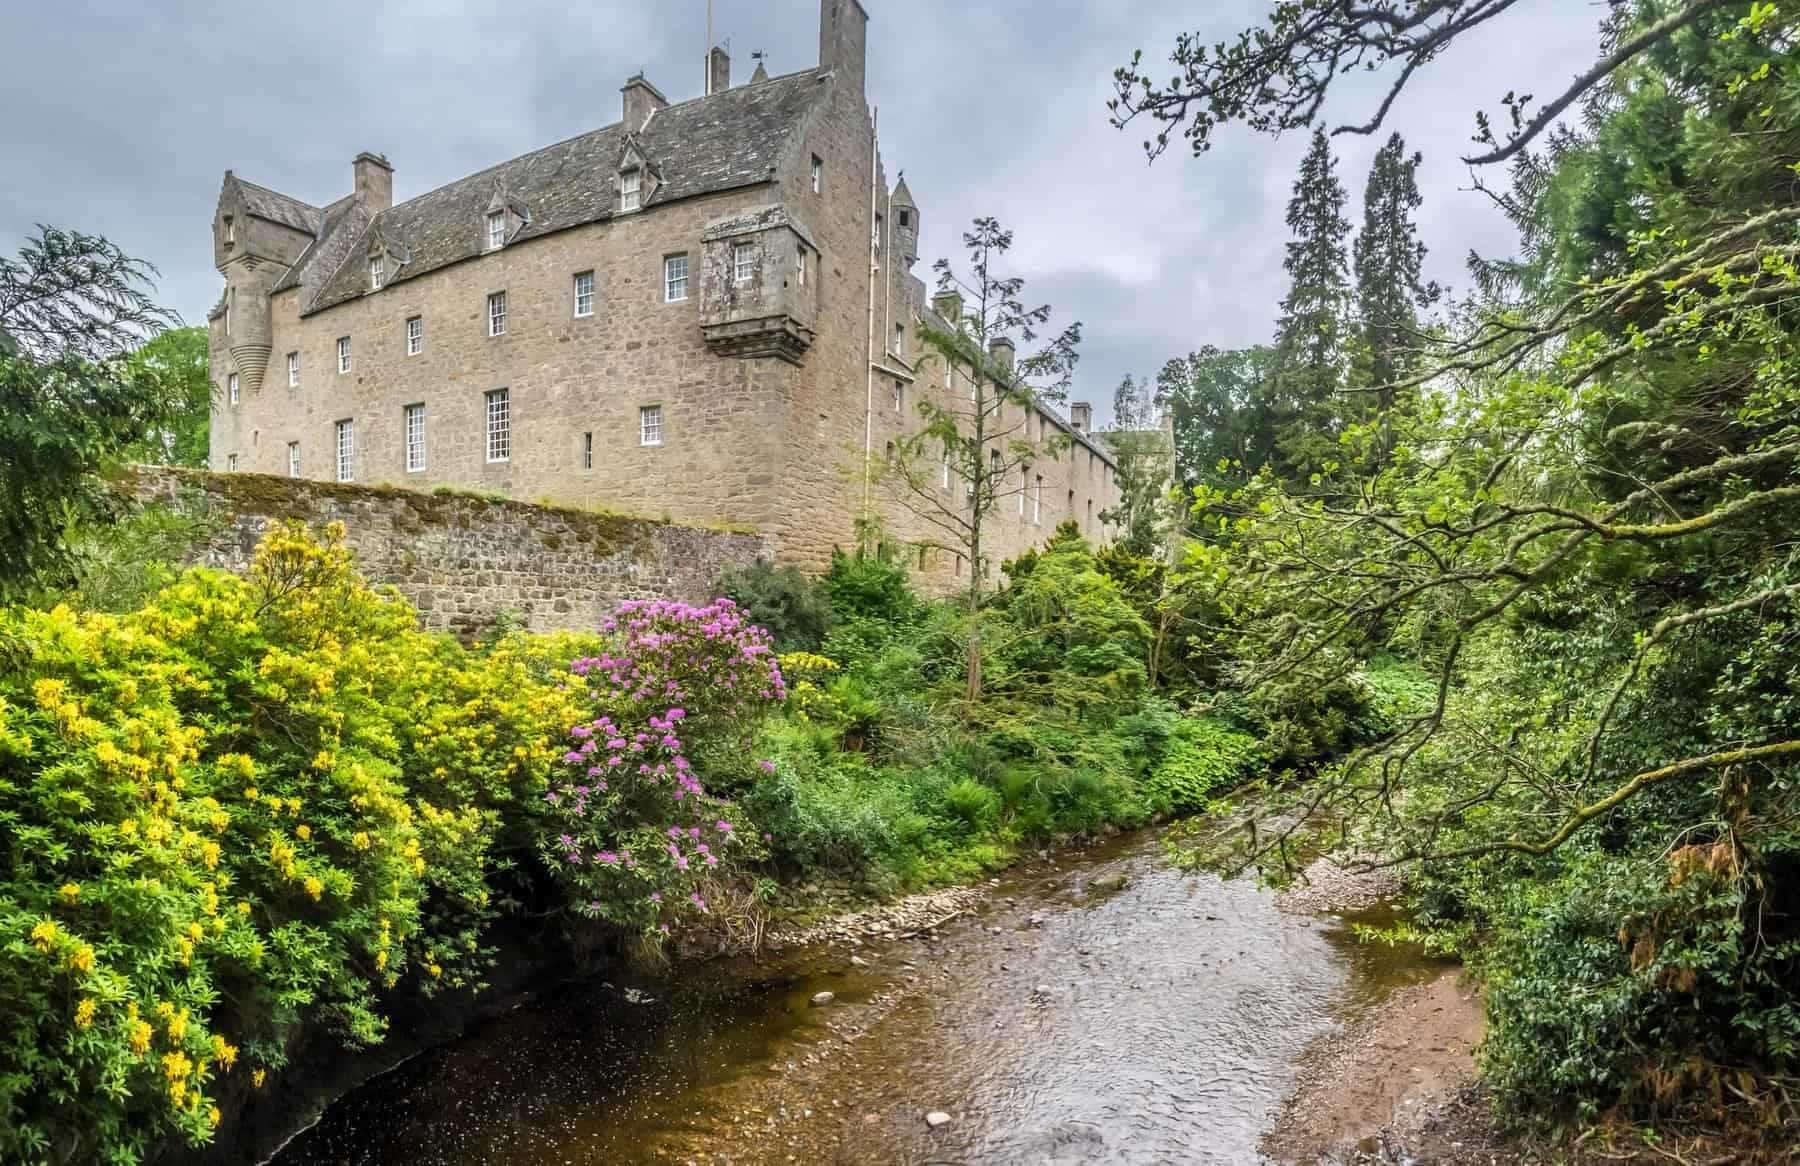 Cawdor castle and its magnificent laburnum arch and river - Scotland